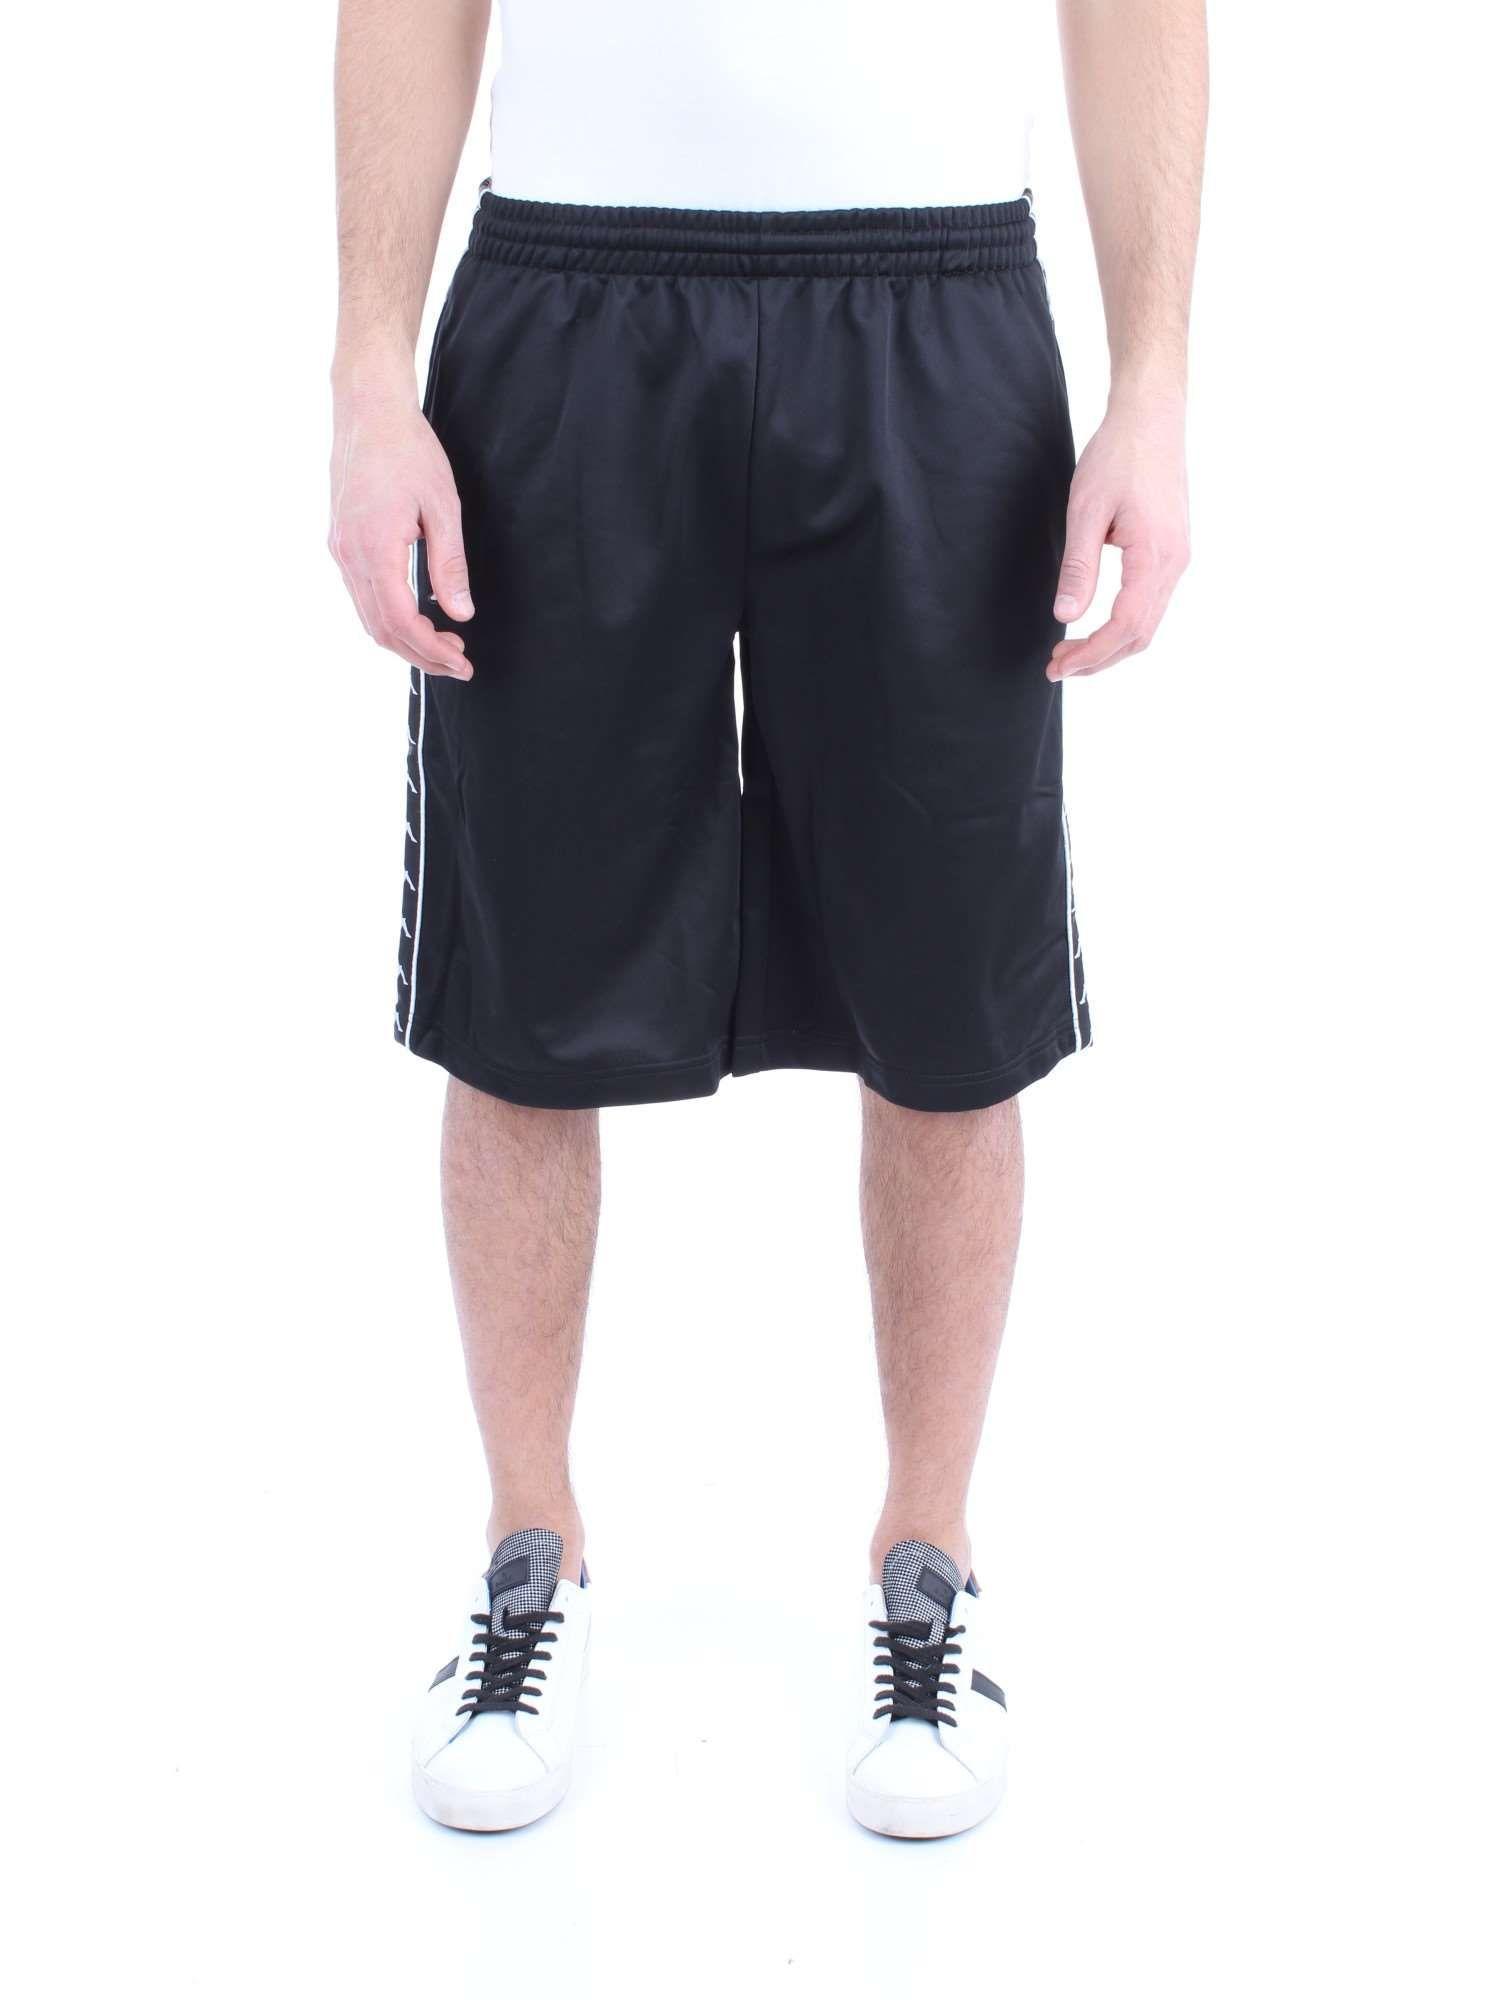 nowy wygląd tani klasyczne dopasowanie Kappa Black Polyester Shorts in Black for Men - Lyst